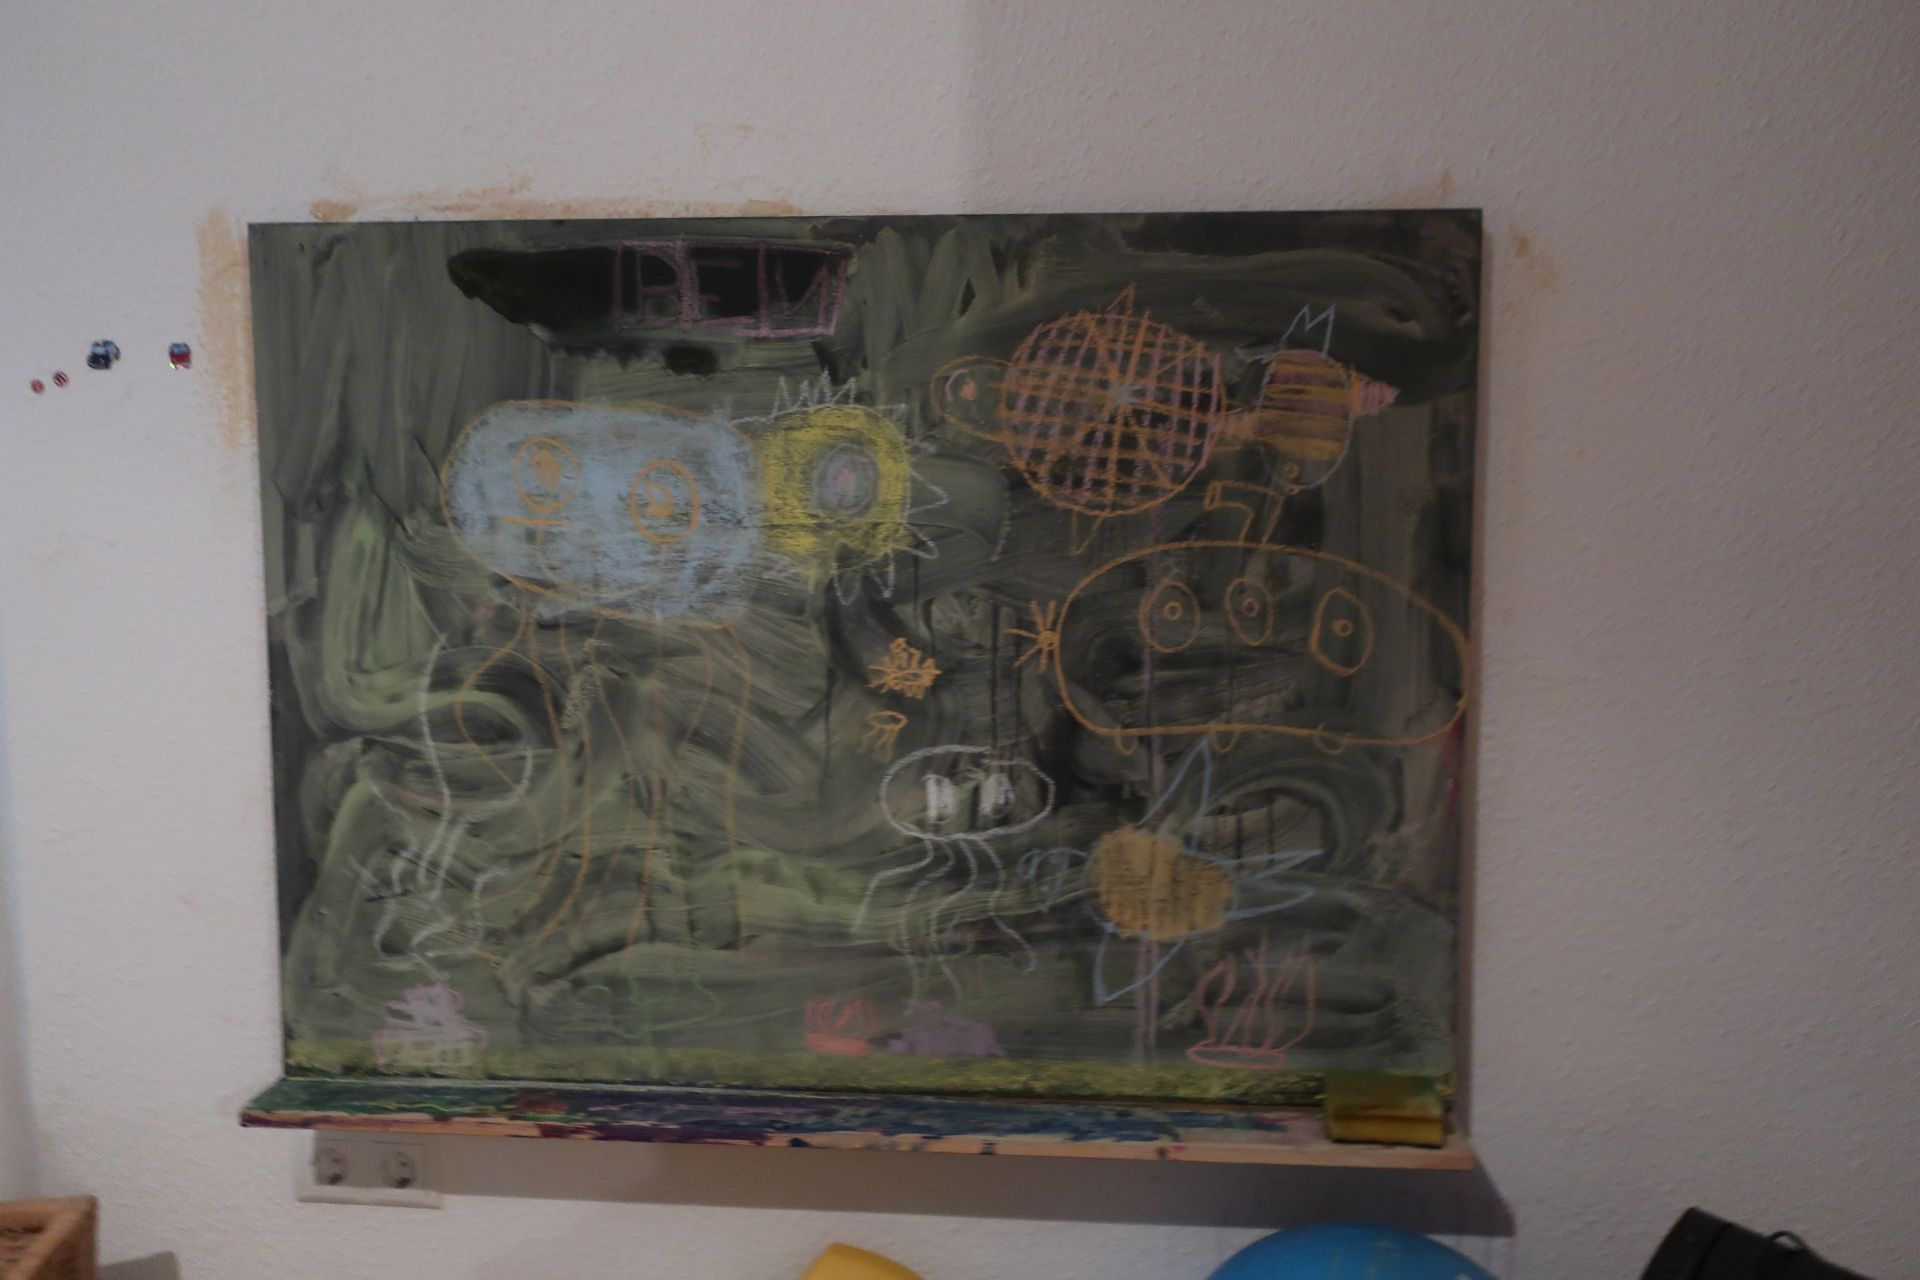 Tafel mit Kreidebild